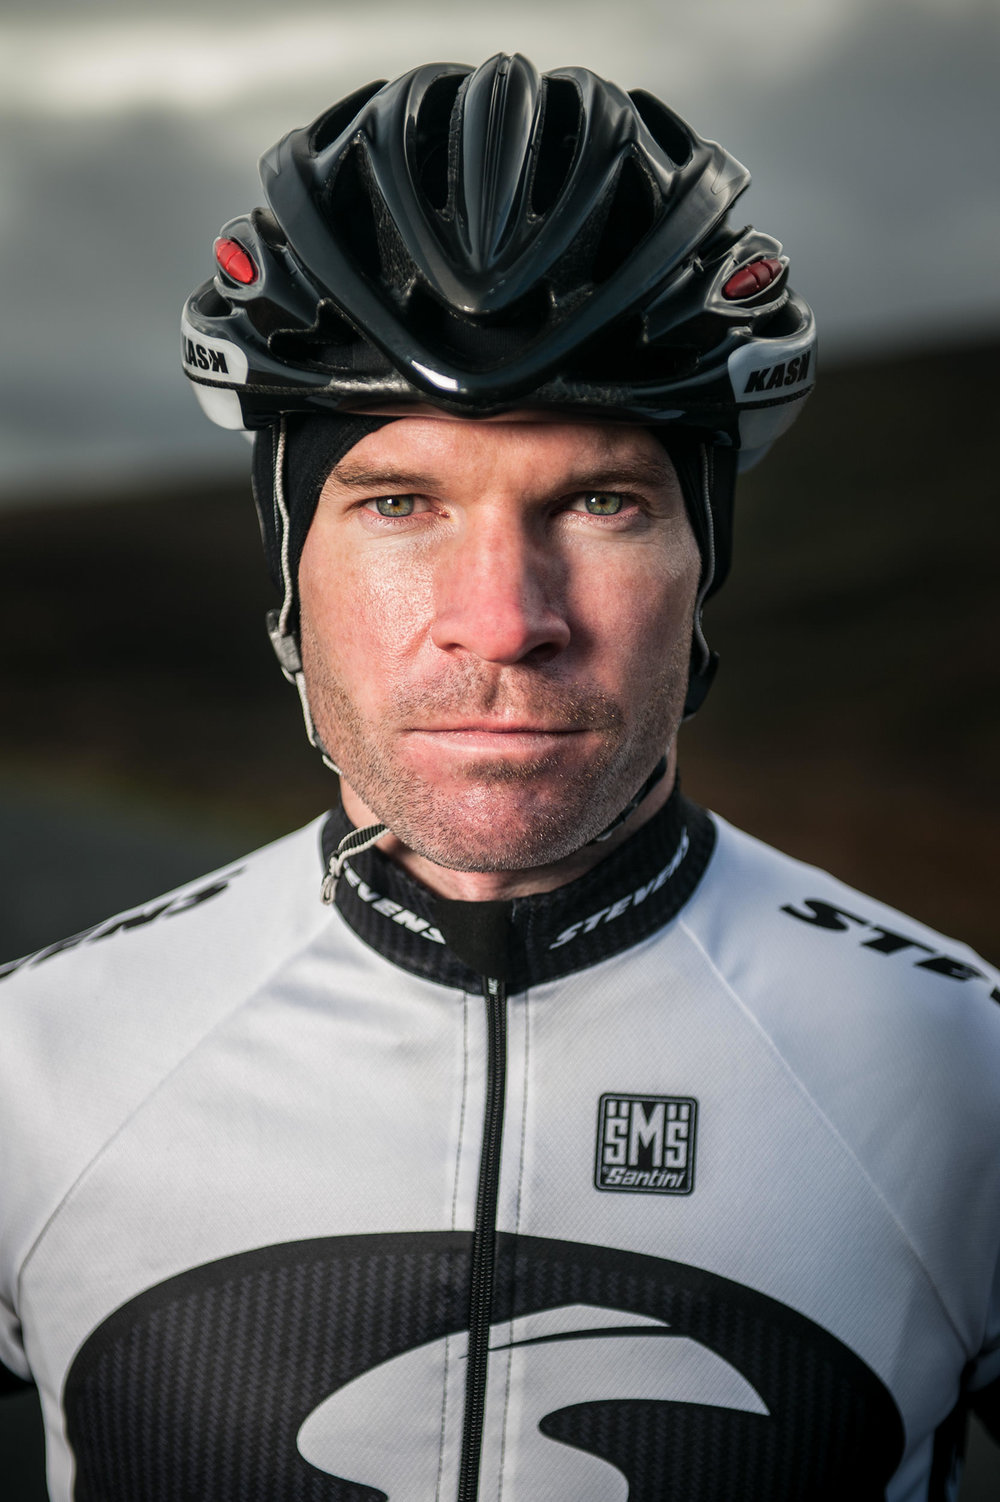 28-outdoor-ireland-mountains-wicklow-cycling-road-bike-portrait.jpg